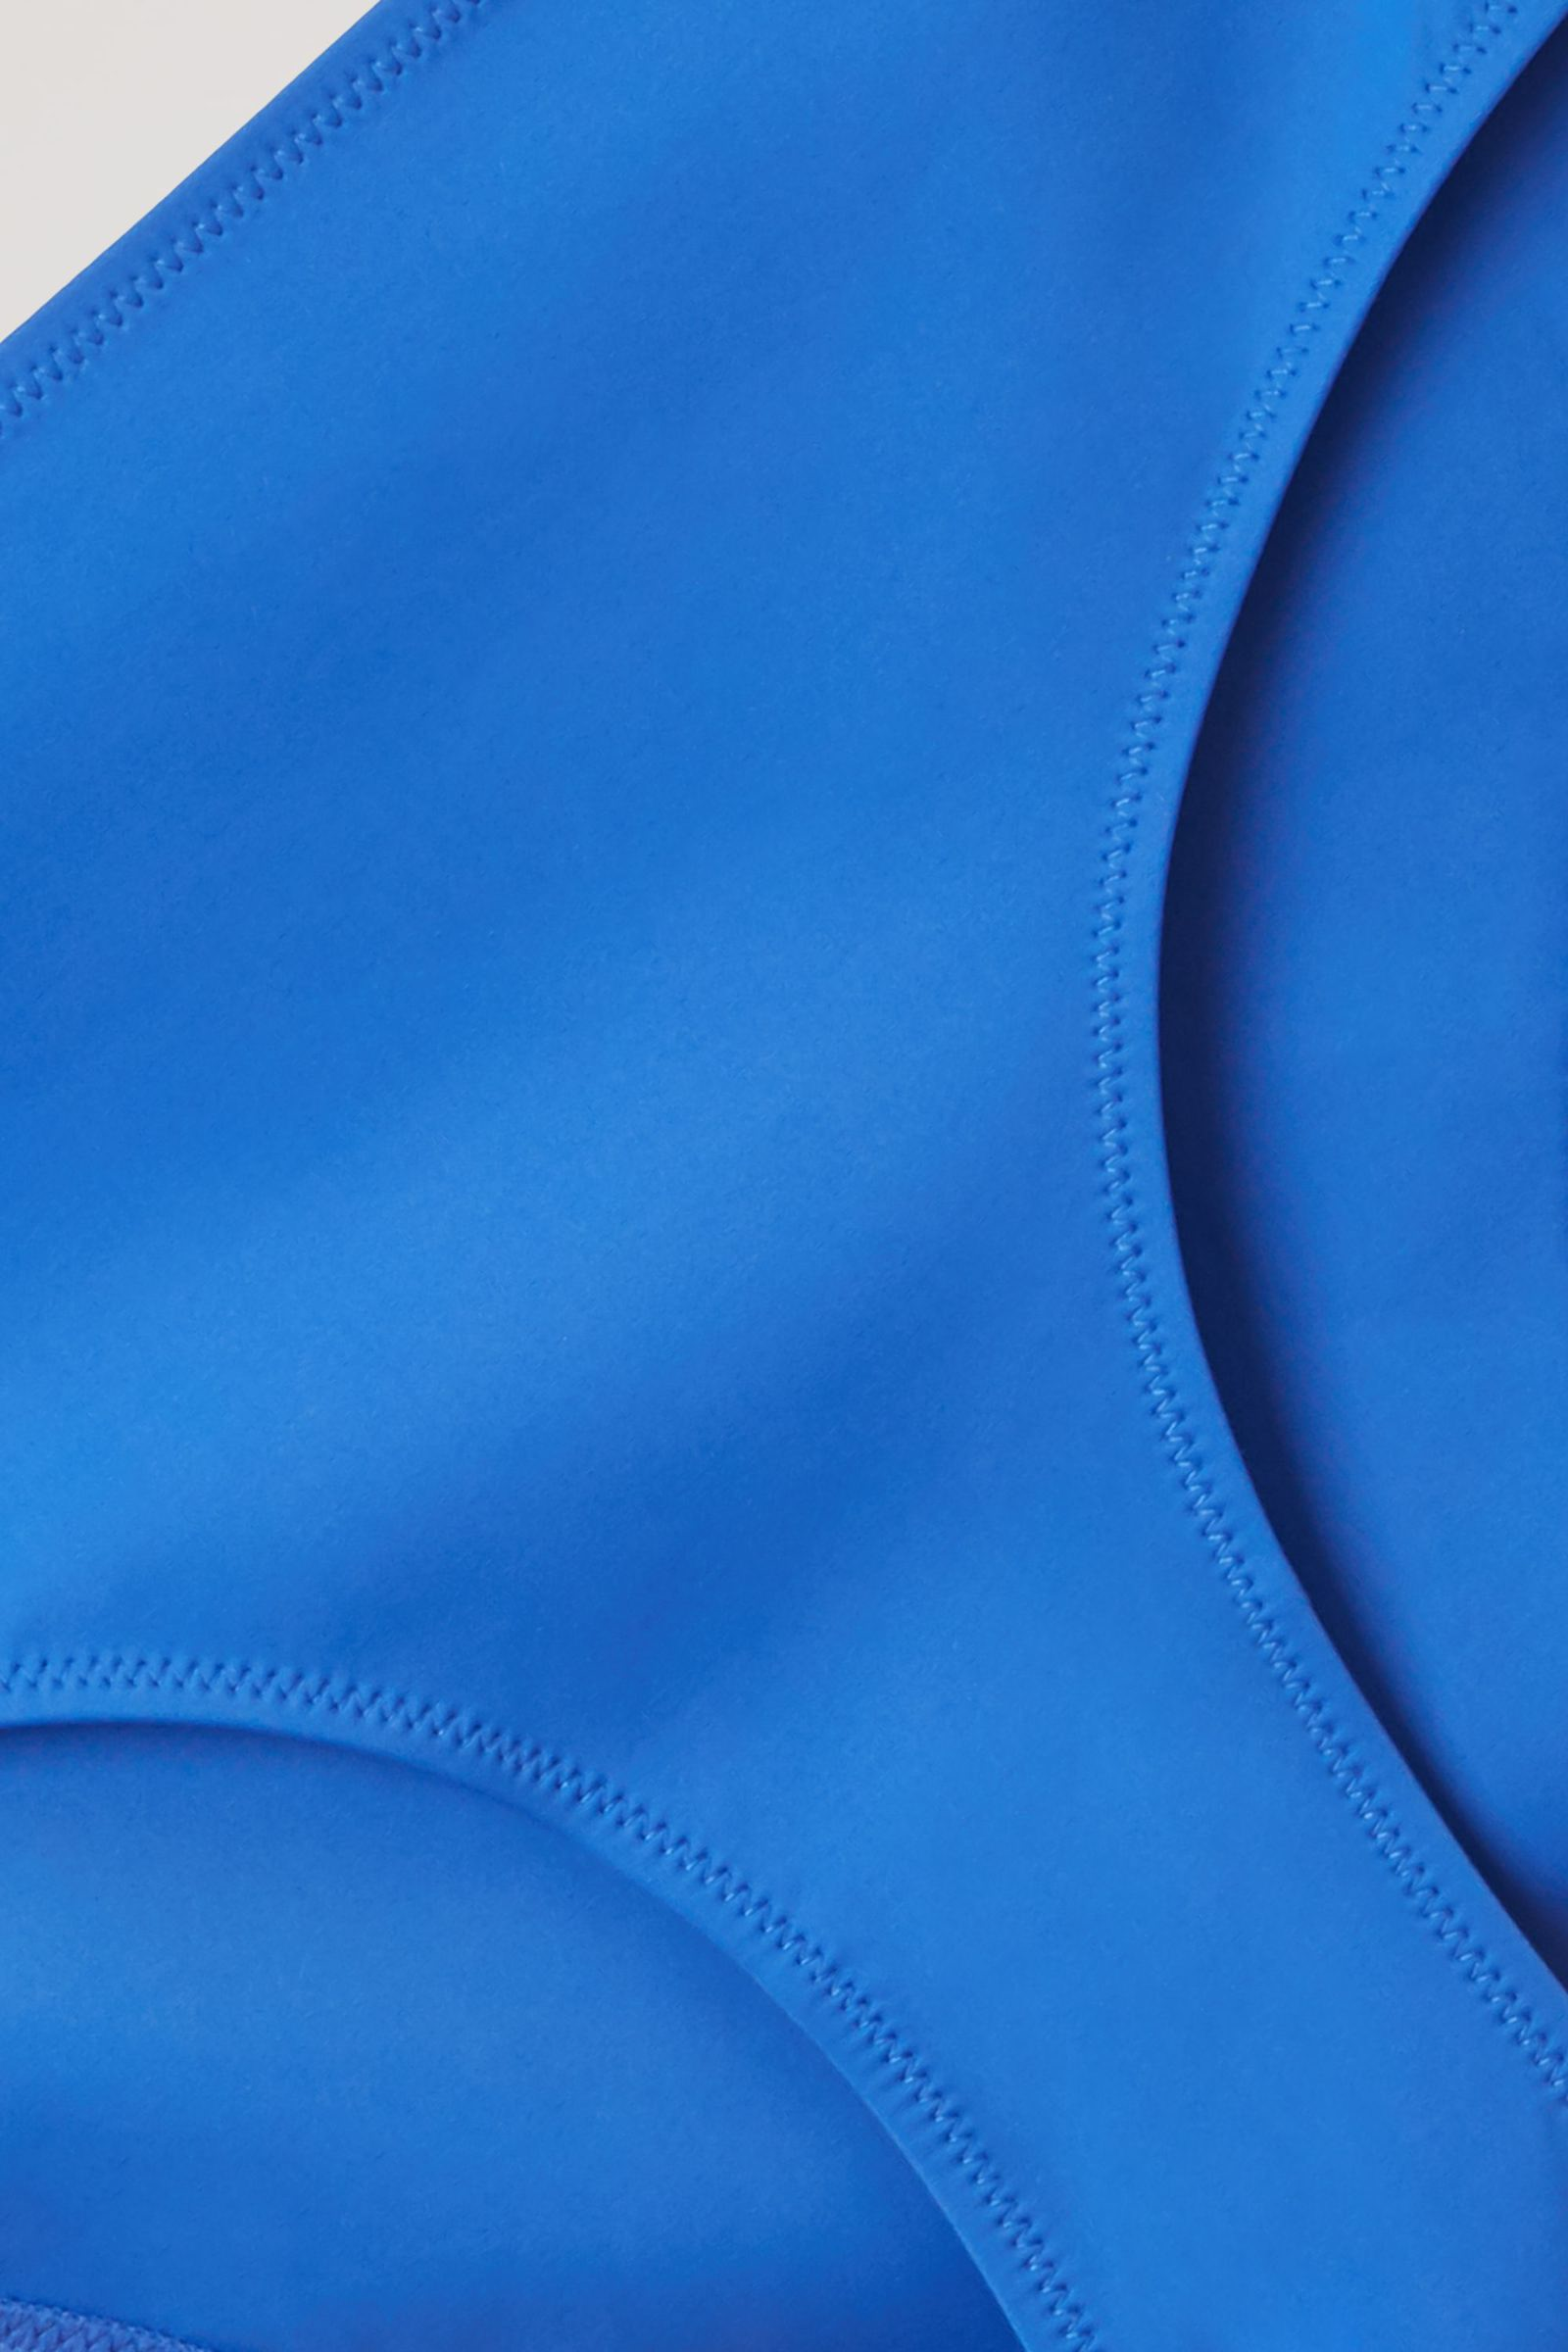 COS 리사이클 나일론 브라질리언 핏 비키니 바텀의 브라이트 블루컬러 Detail입니다.